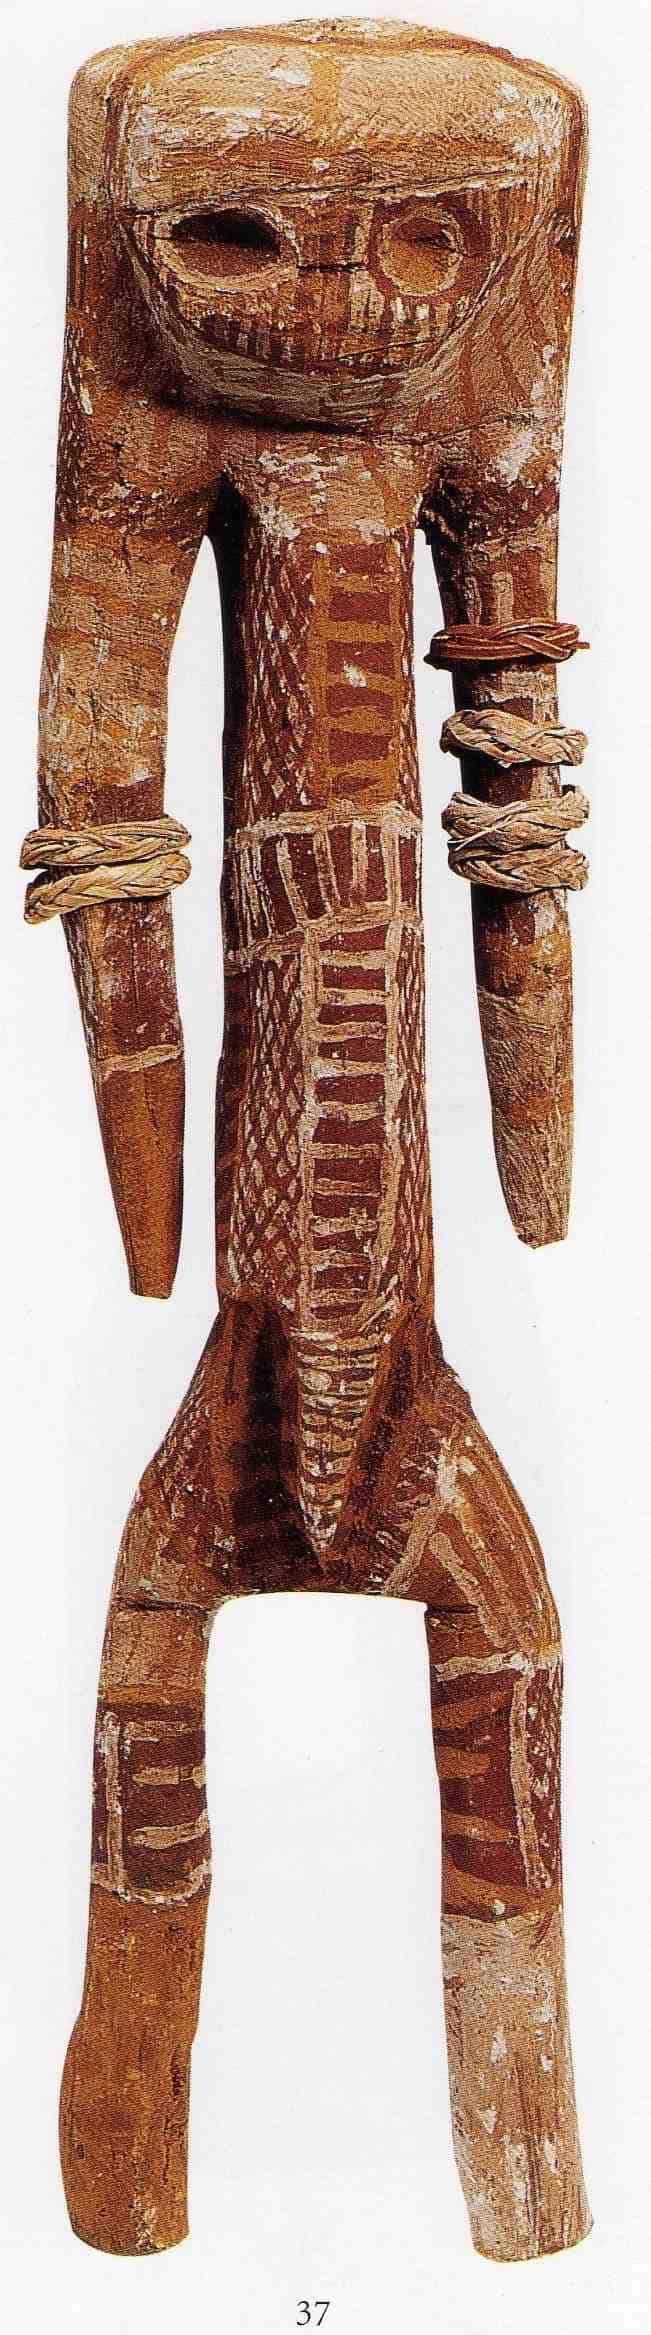 ENRAELD DJULABINYANNA Munkara